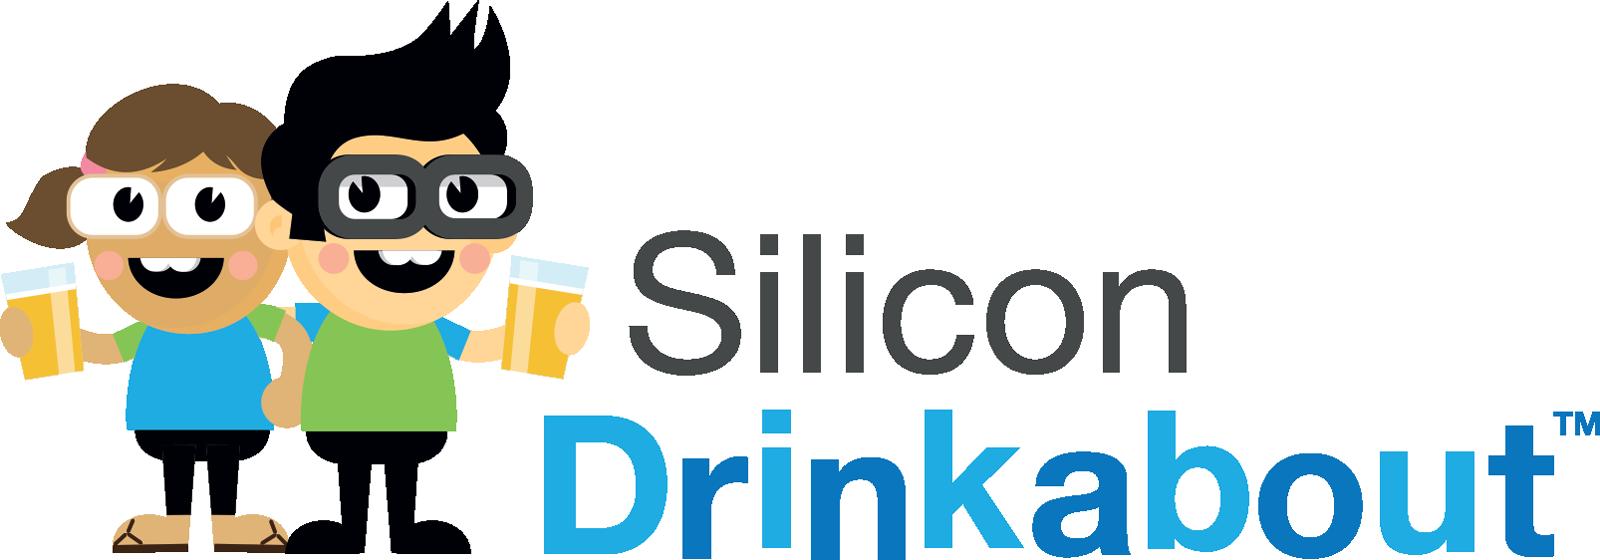 new-logo-1600px-drinkabaut